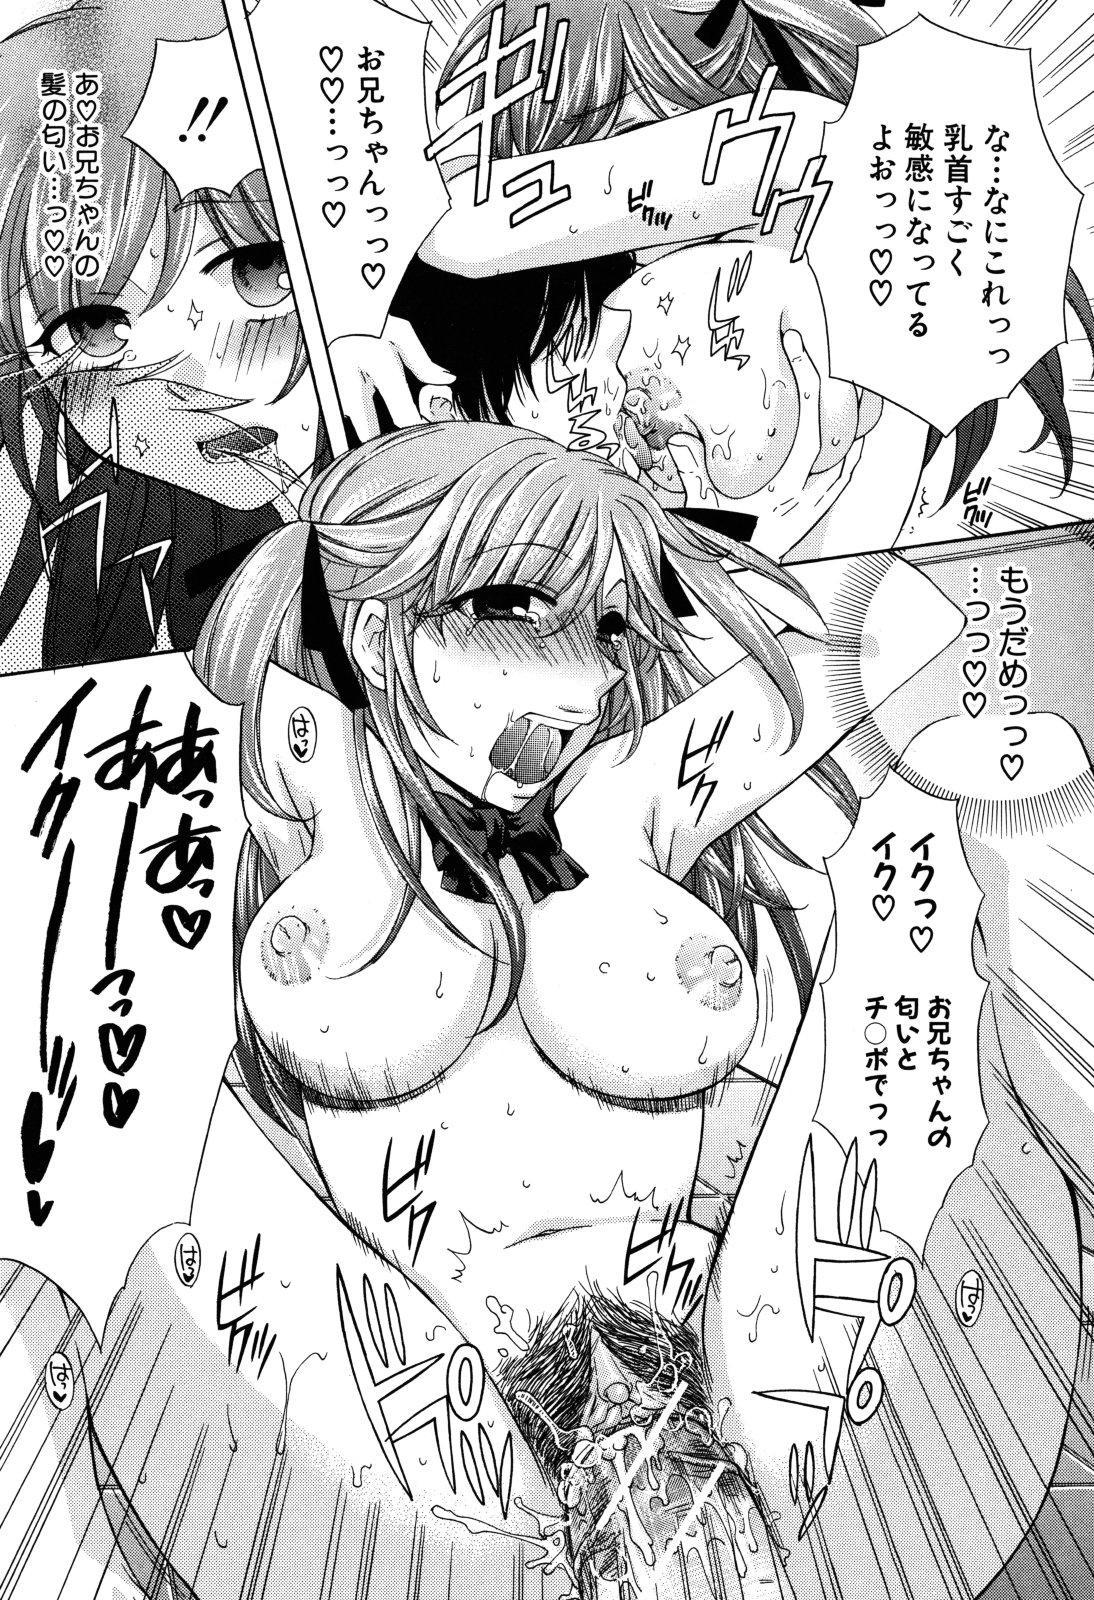 Kanojo ga Ochiru made - She in the depth 84